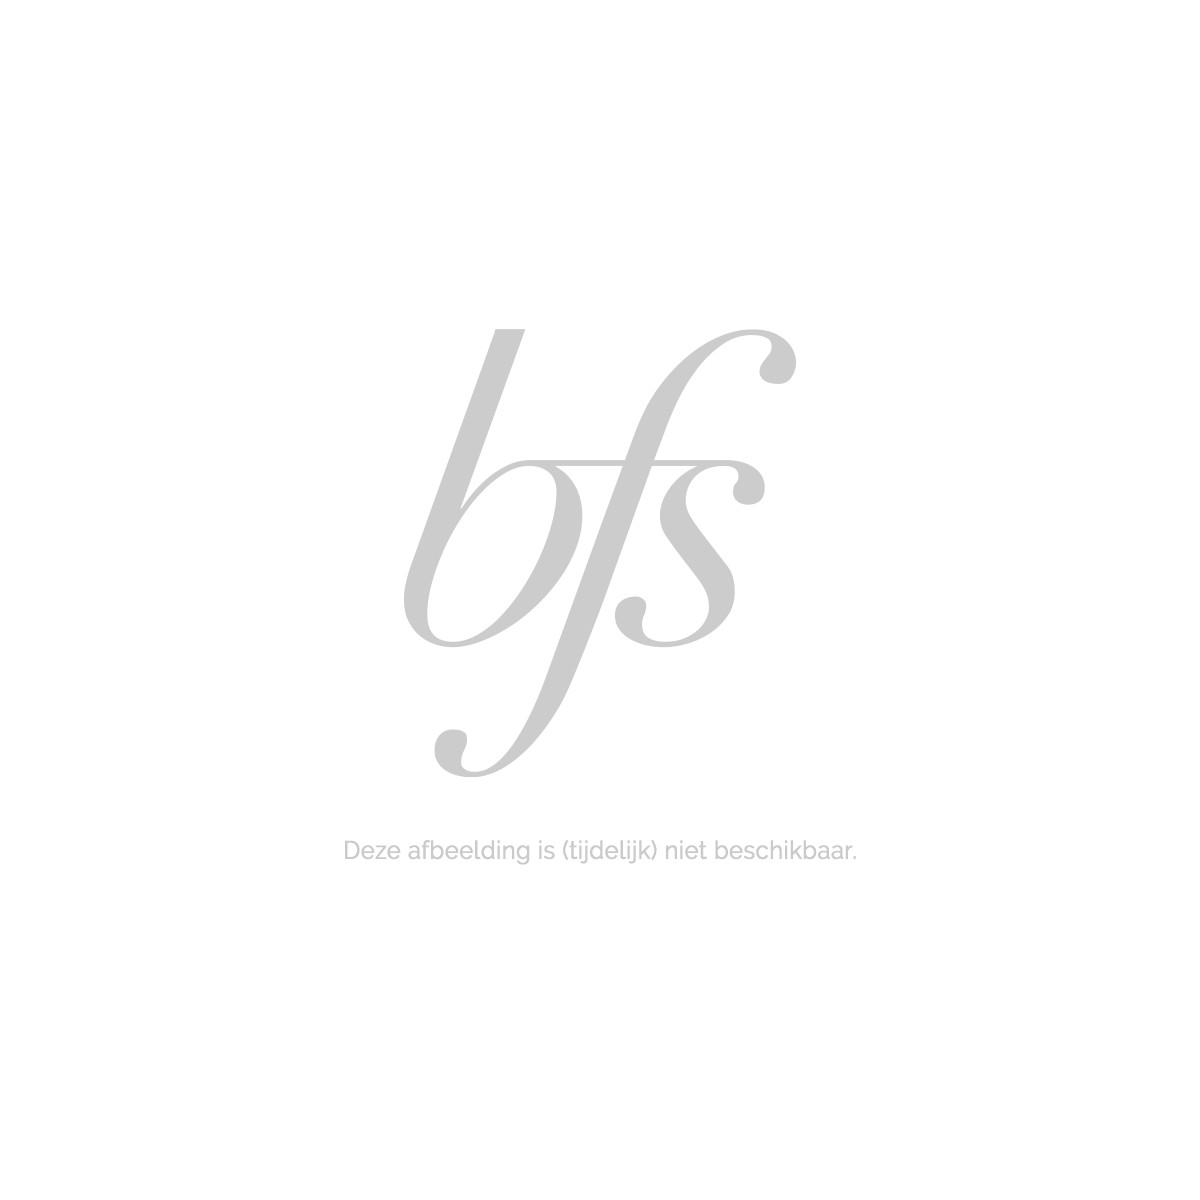 Ibp Designer Stiletto Tips Clear 12Pcs